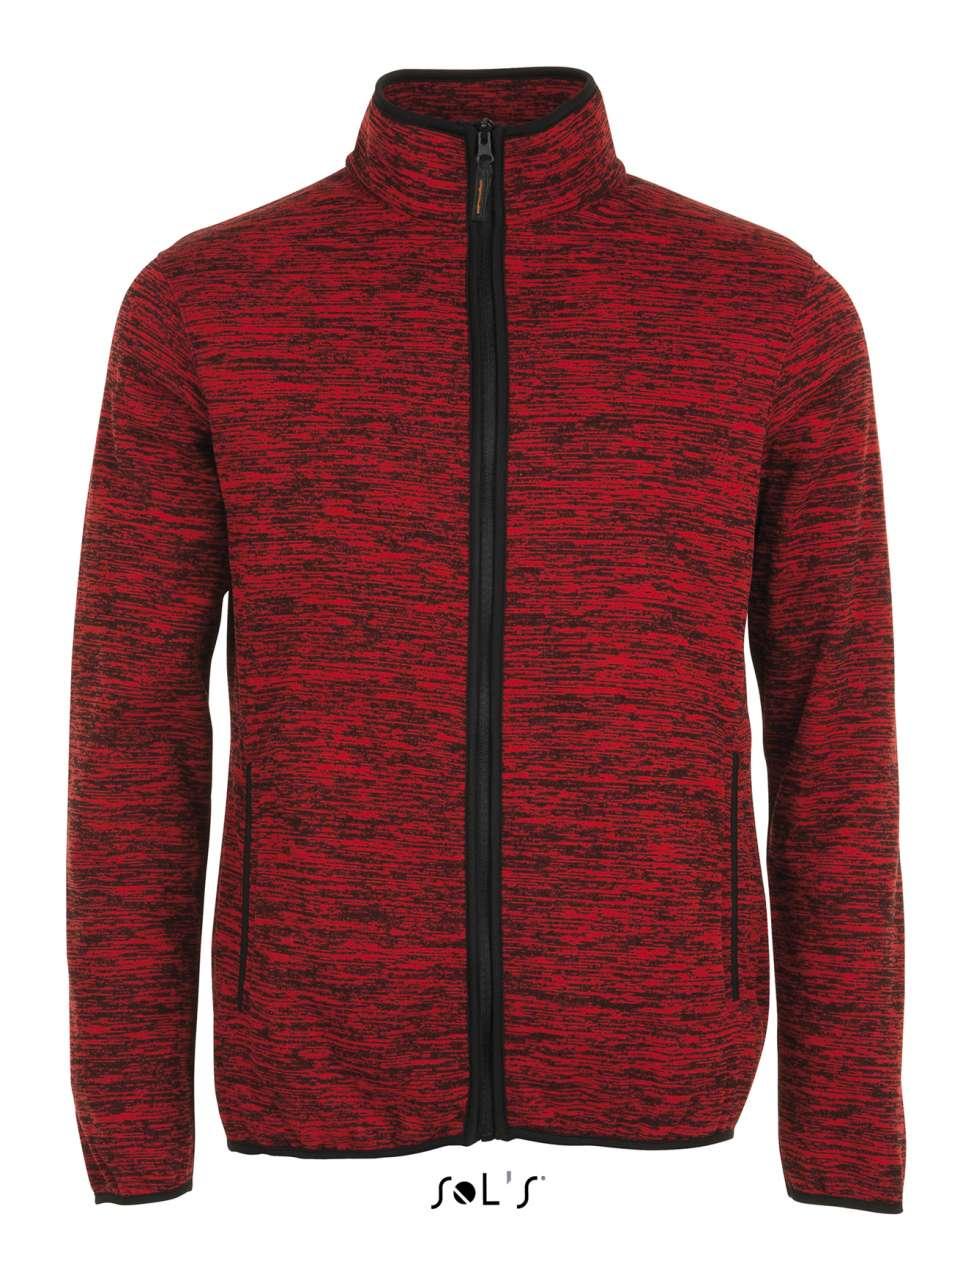 Fleece SO01652 rosu gri negru Jachete ploaie impermeabile softshell polar fleece veste termotransfer serigrafie broderie dama barbat unisex buzunare membrana anti vant